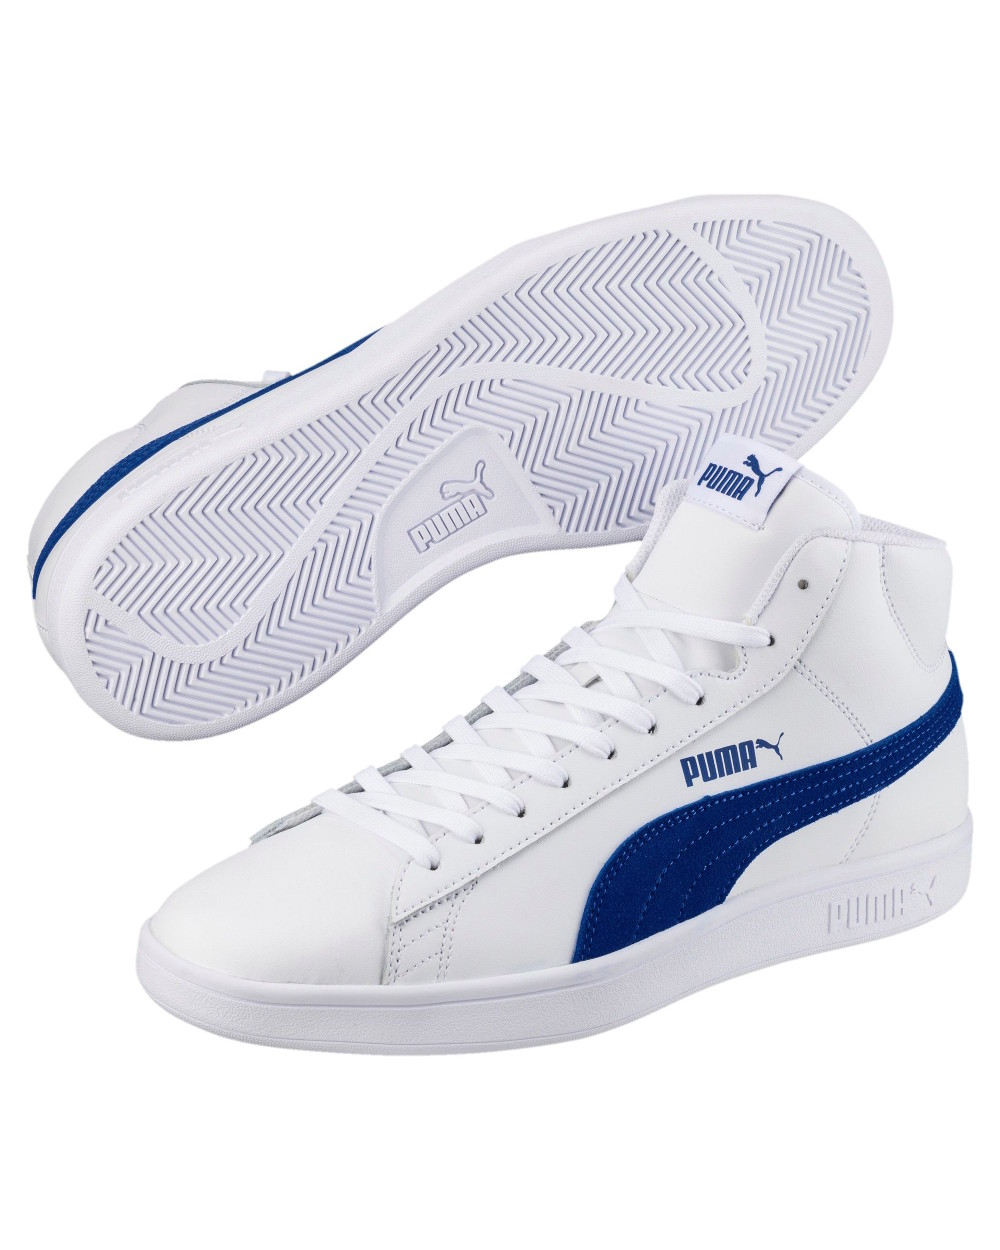 e15e4081942 Tenis Puma Sportswear Sport Smash Vl Zapatos SzwqH0U